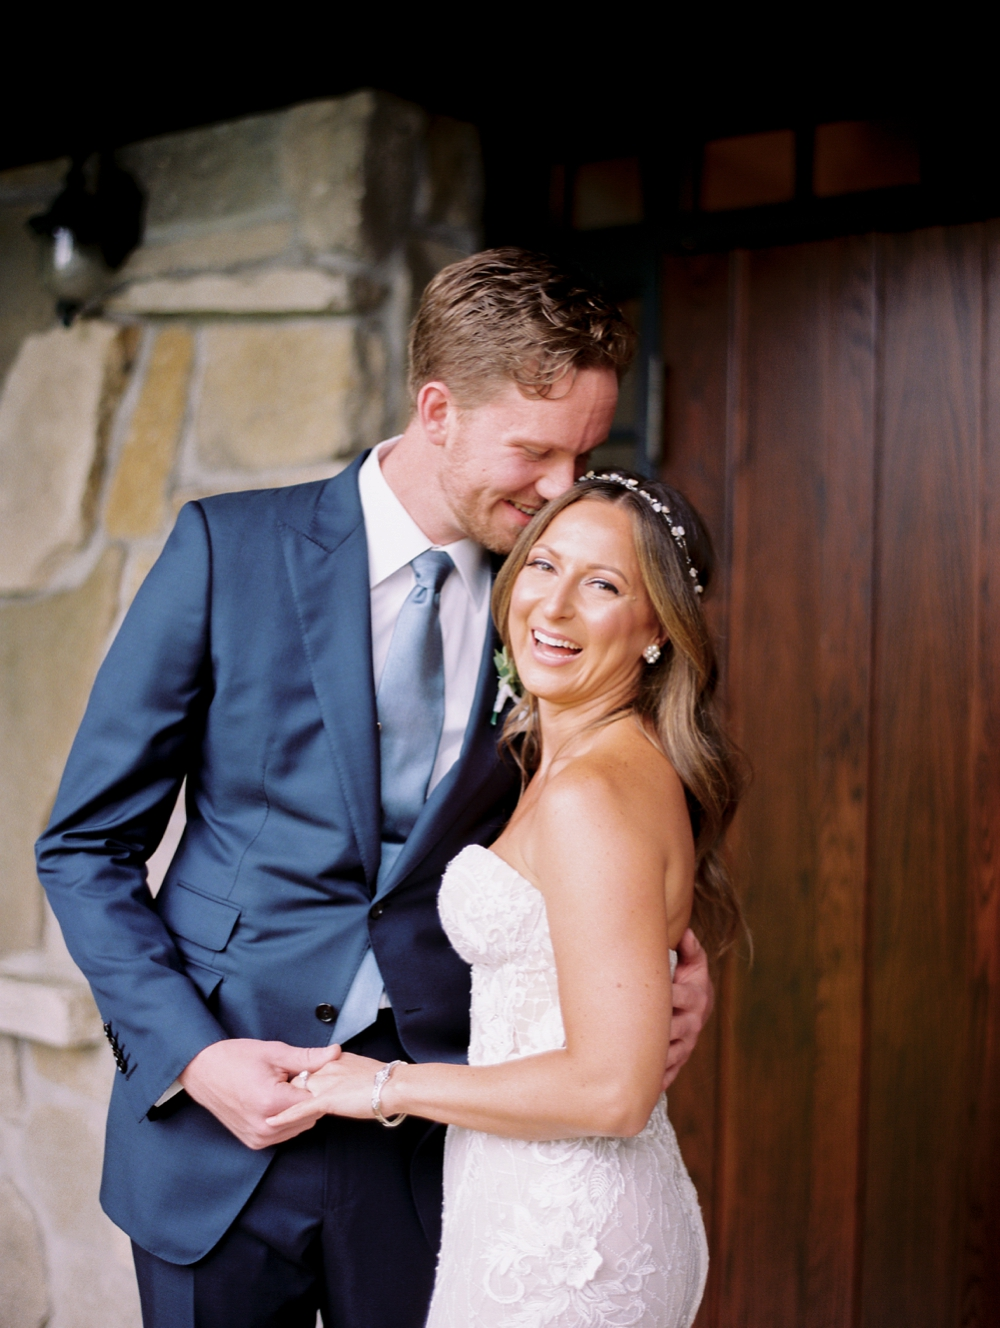 Kristin-La-Voie-Photography-CHICAGO-WEDDING-PHOTOGRAPHER-KOHLER-WHISTLING-STRAITS-100